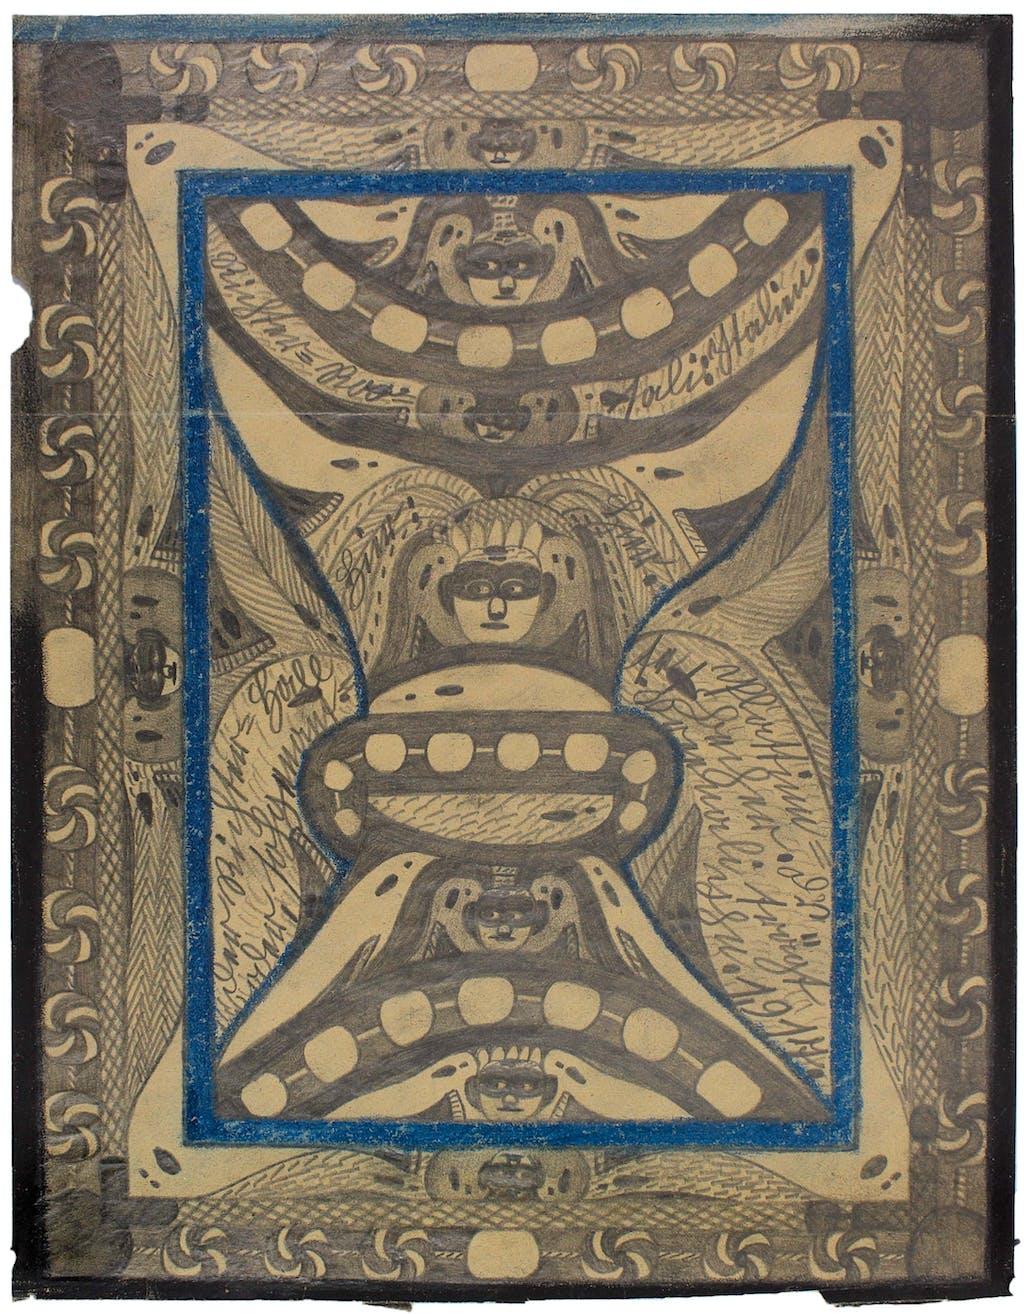 Adolf Wolfli, untitled  (Der Richter-Hall, oder, sogenanntee Plattinn-Becher: D's Vreeneli trägt ihn)  - © christian berst — art brut